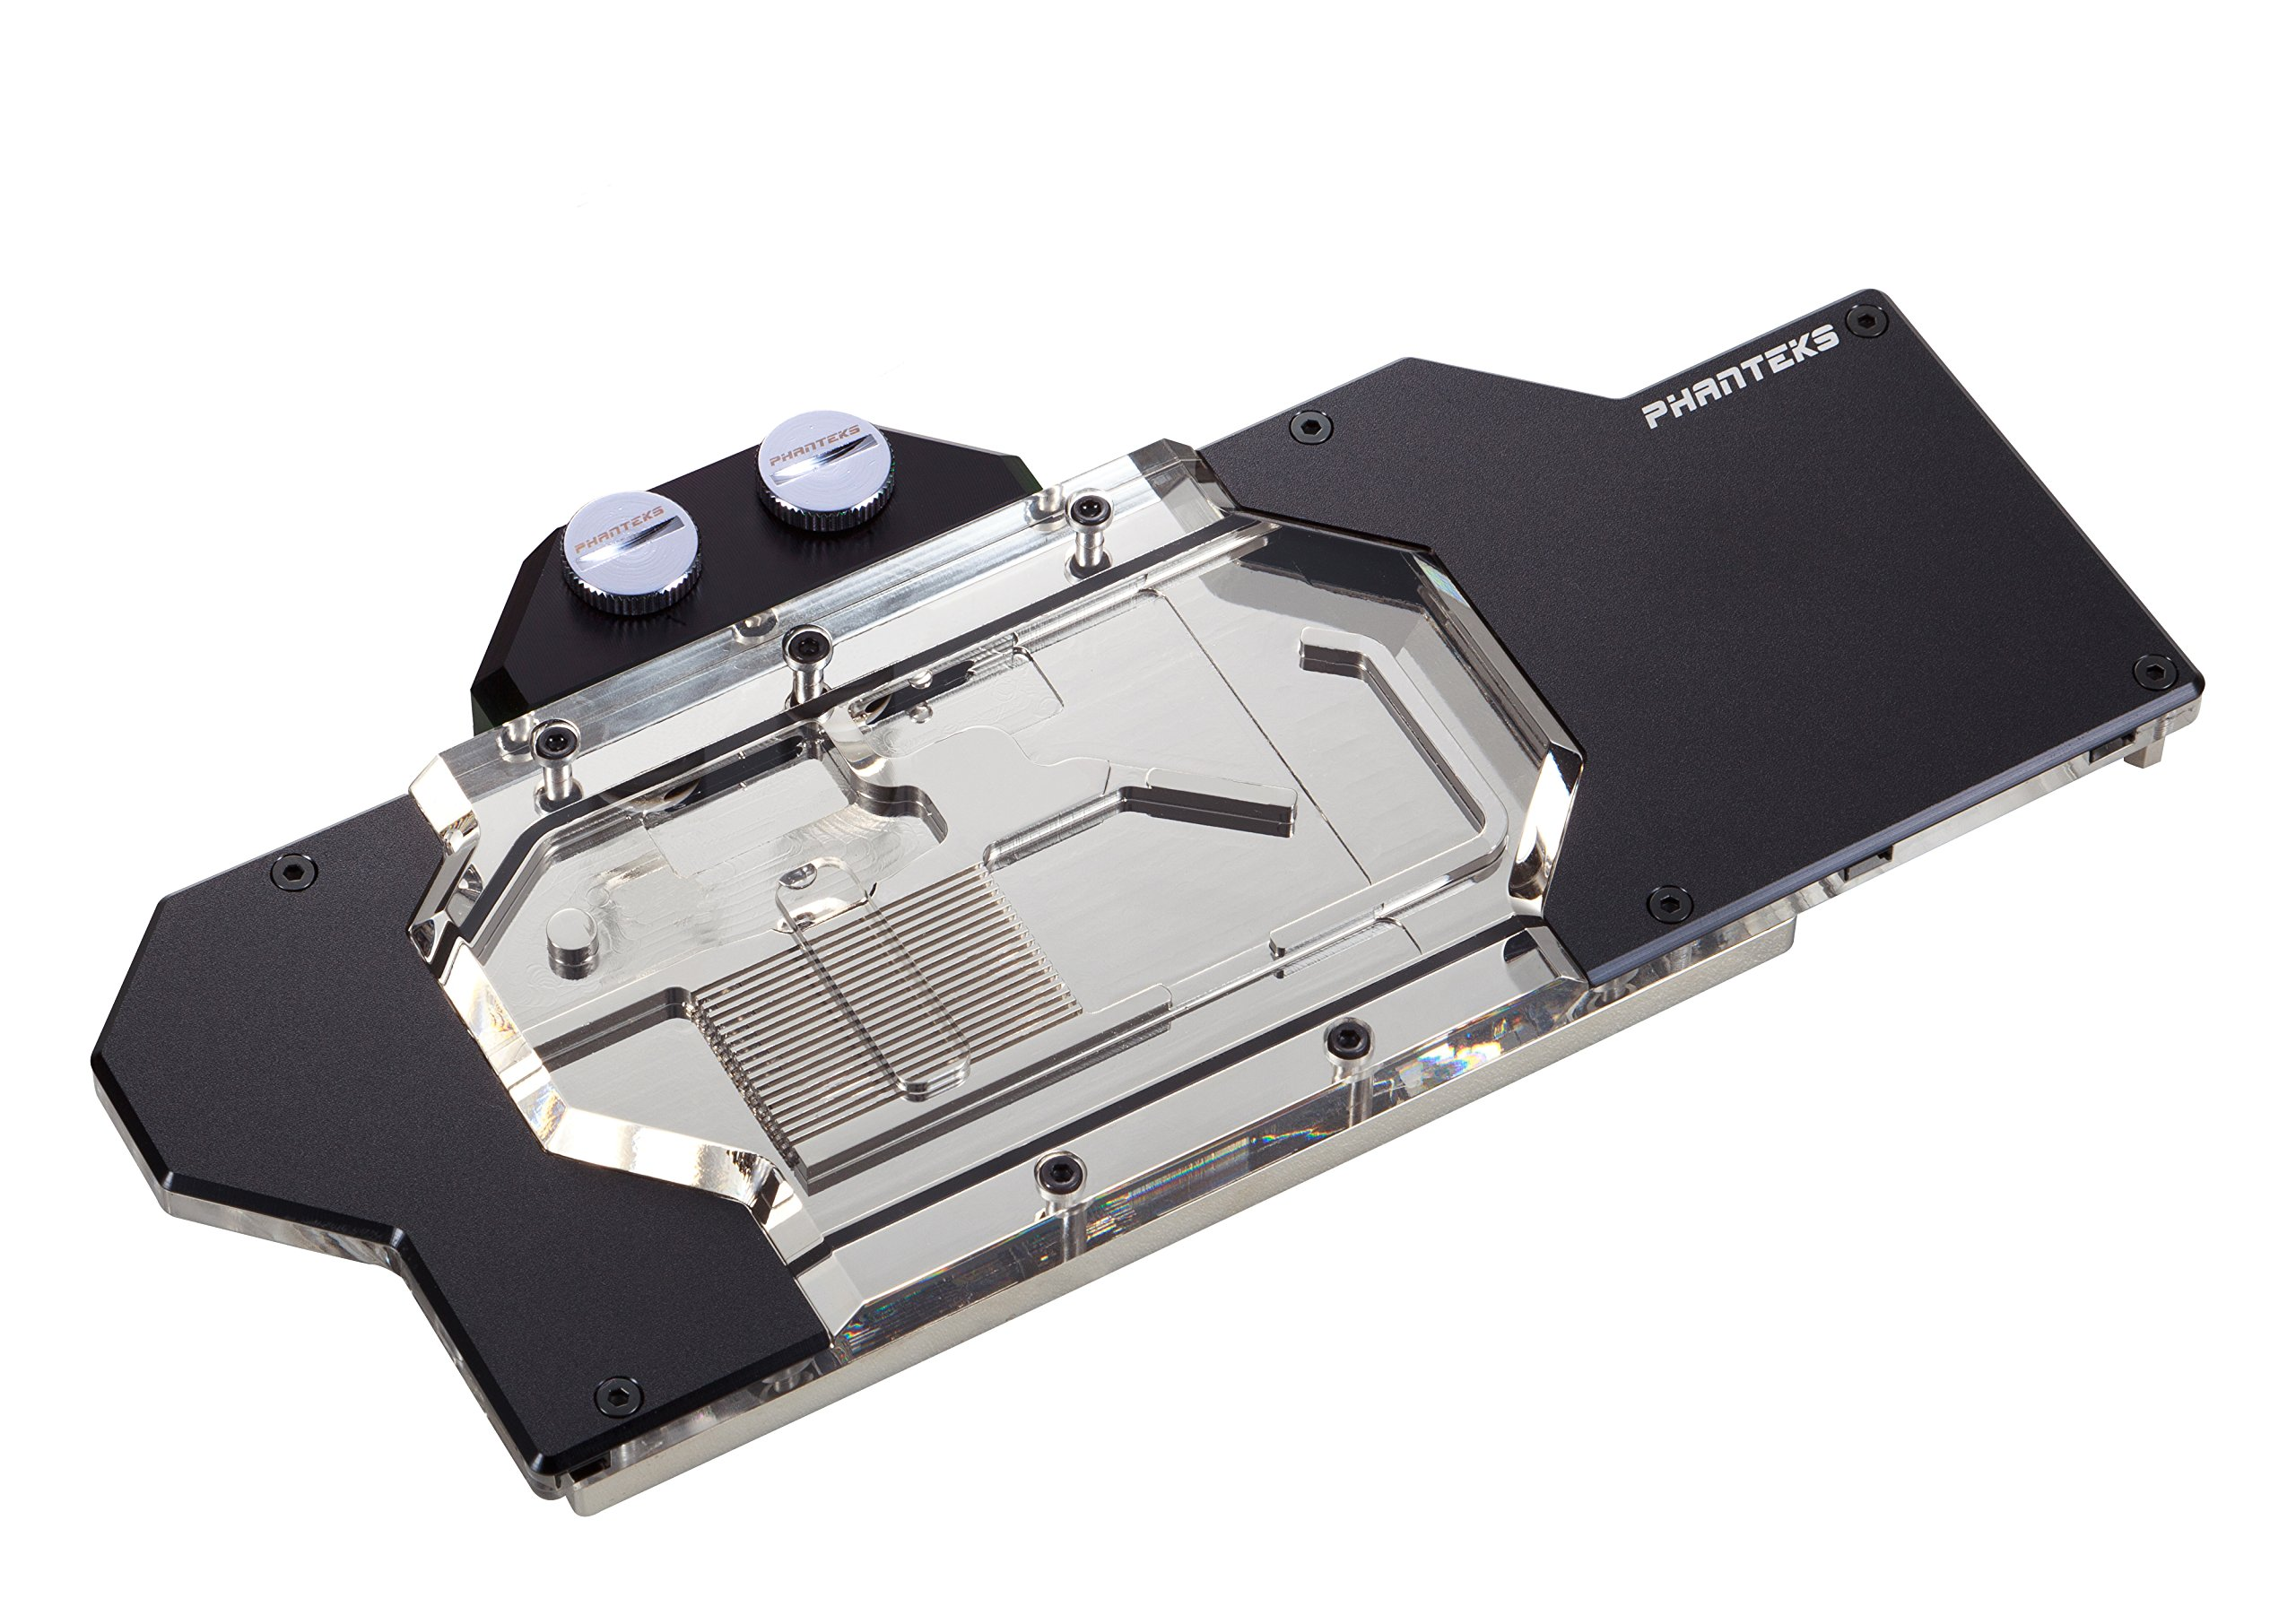 Phanteks G1080 GPU Full Cover Water Block for NVIDIA 1080/1070 Founder Edition PH-GB1080FE_CBKLD_01 by Phanteks